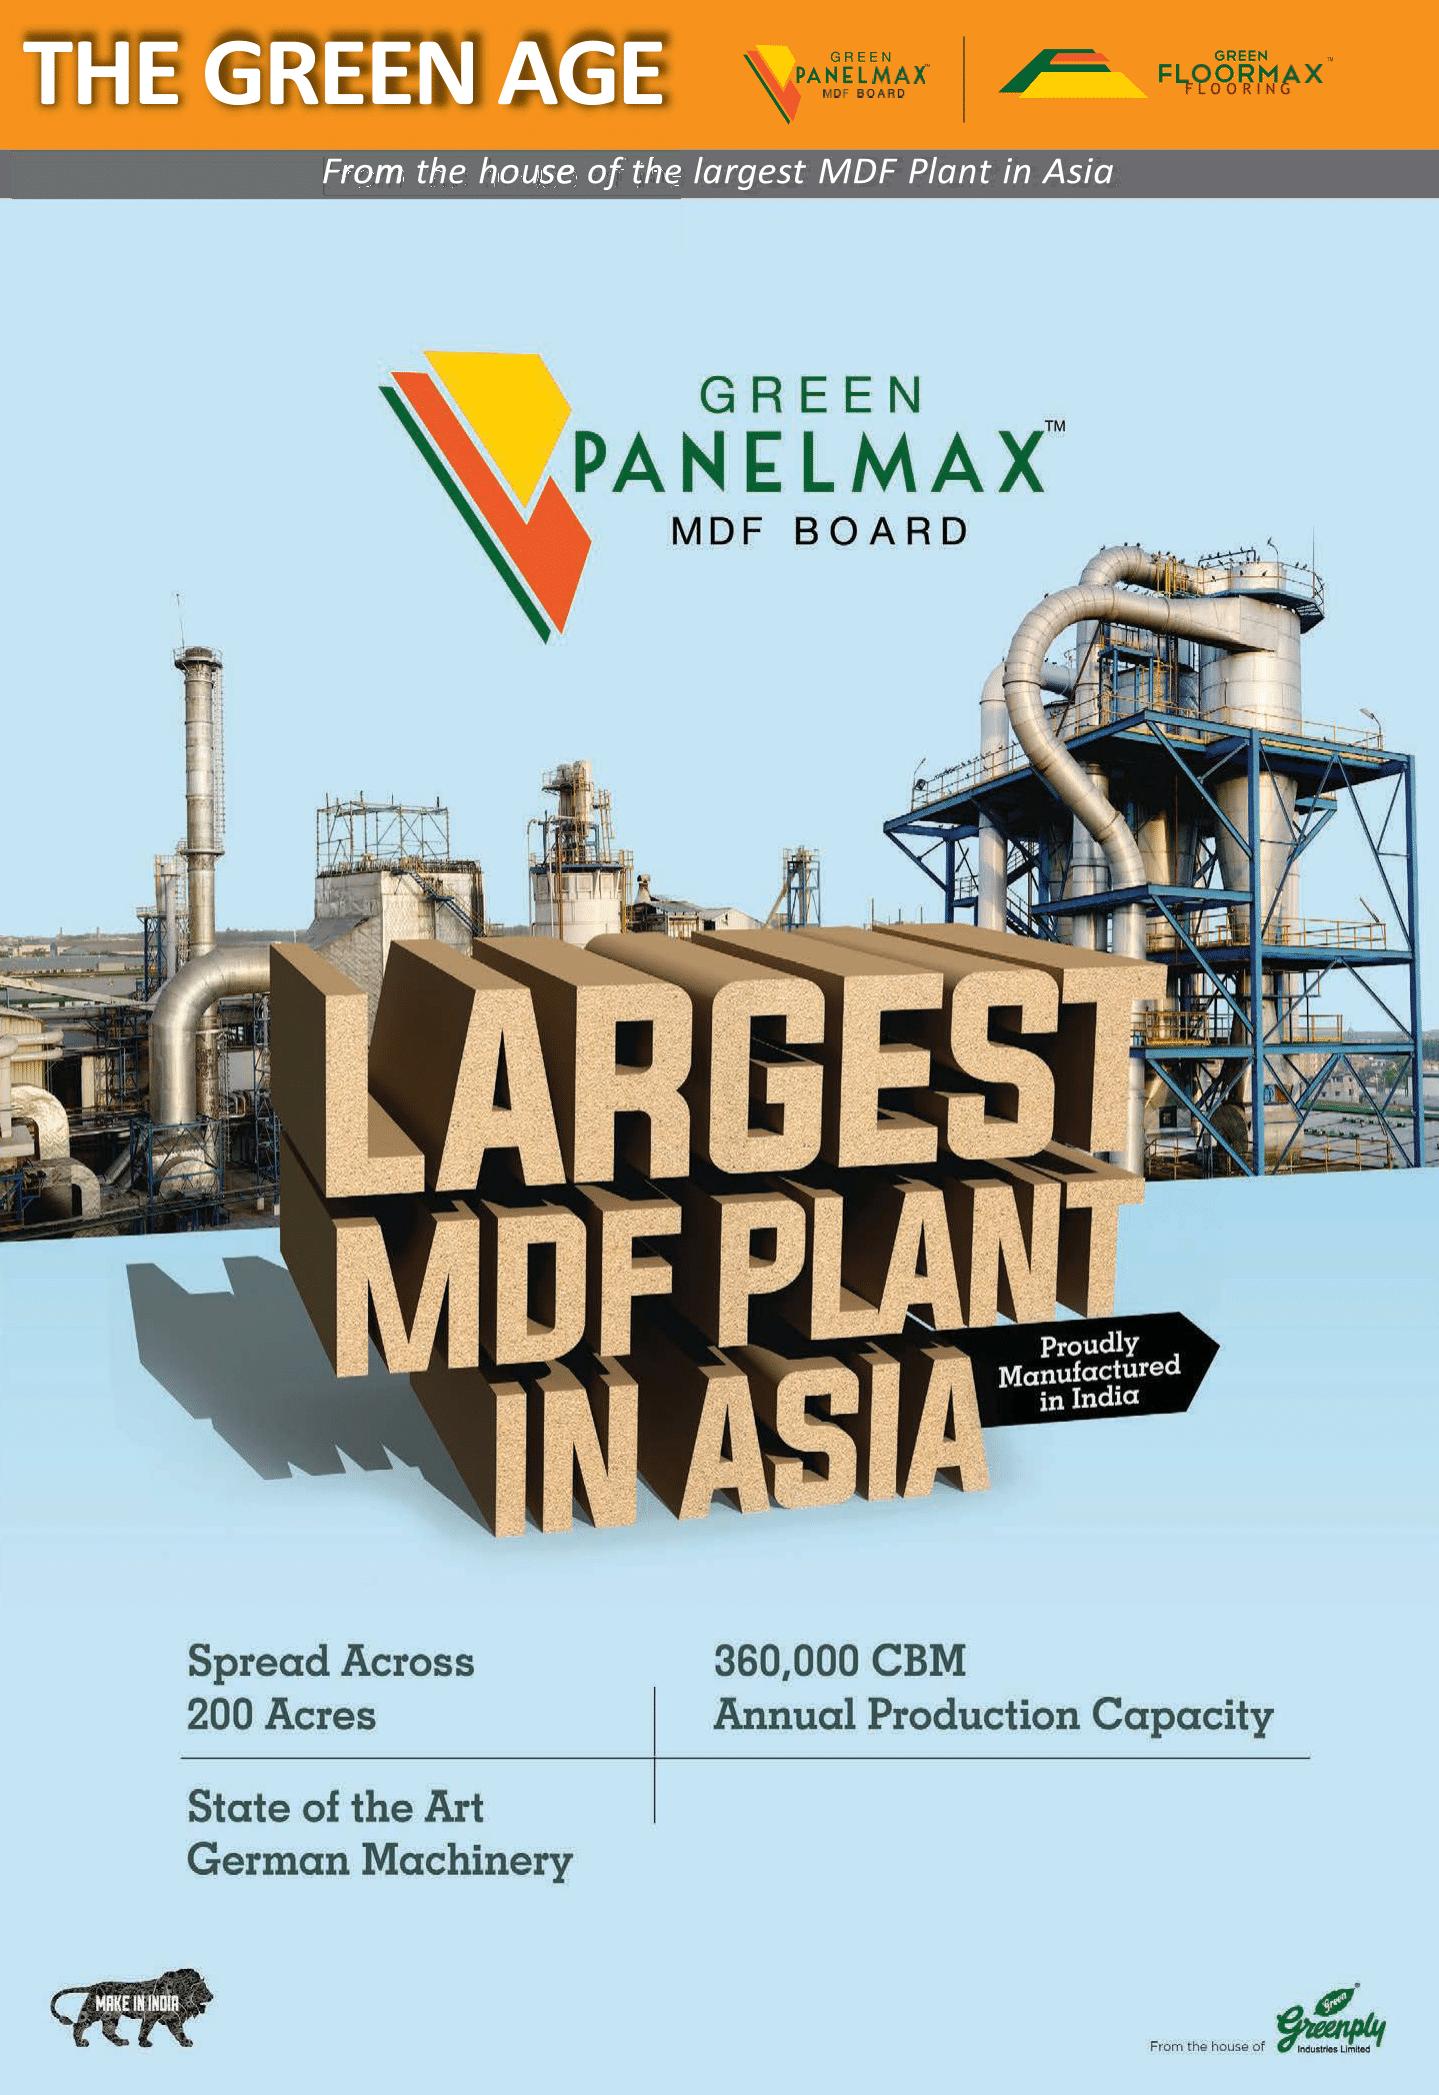 Shobhan Mittal: Greenply sets Medium Density Fibreboard